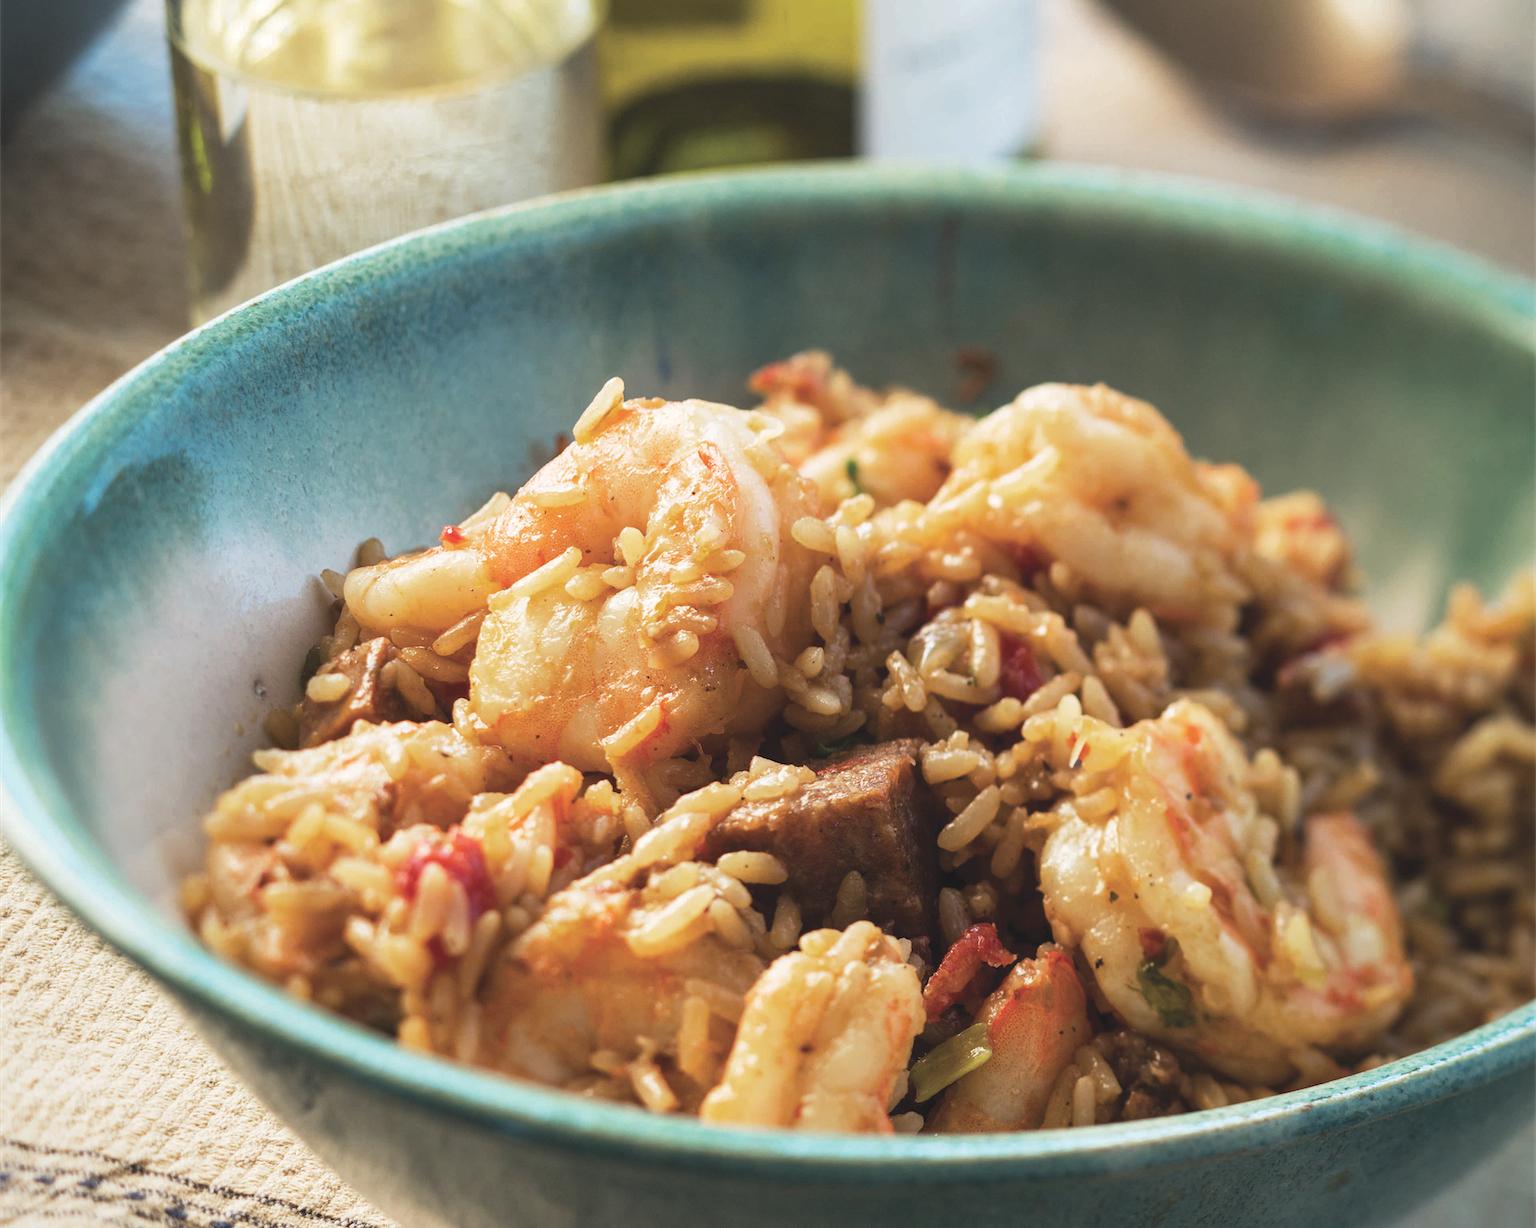 John beshs classic creole seafood jambalaya food republic forumfinder Choice Image